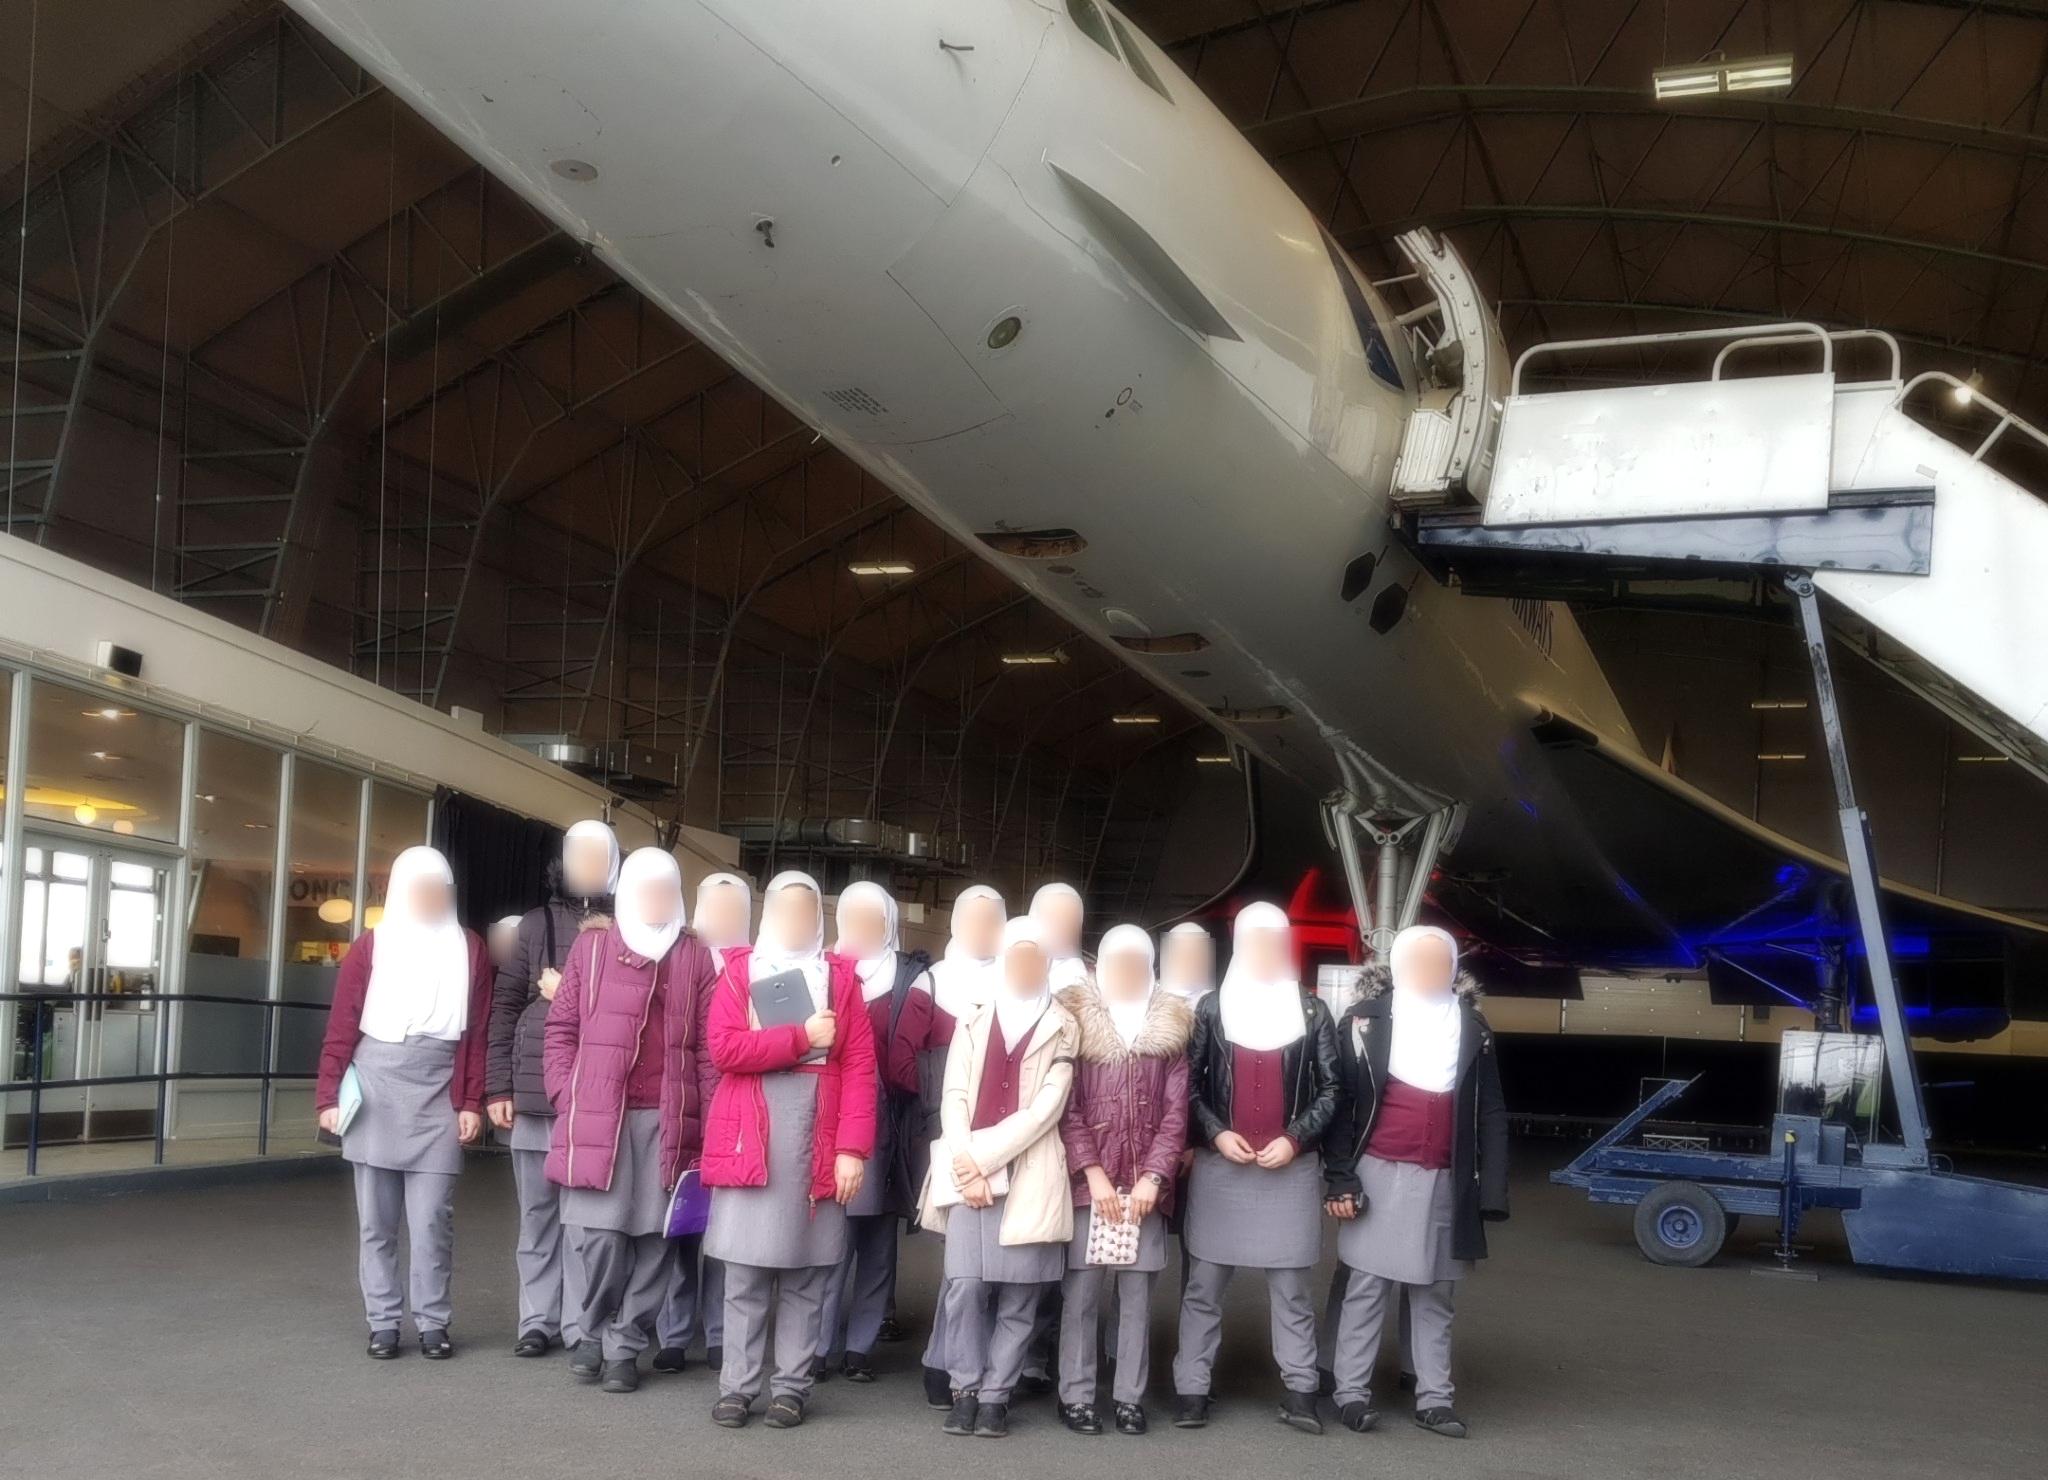 Visiting Concorde G-BOAC